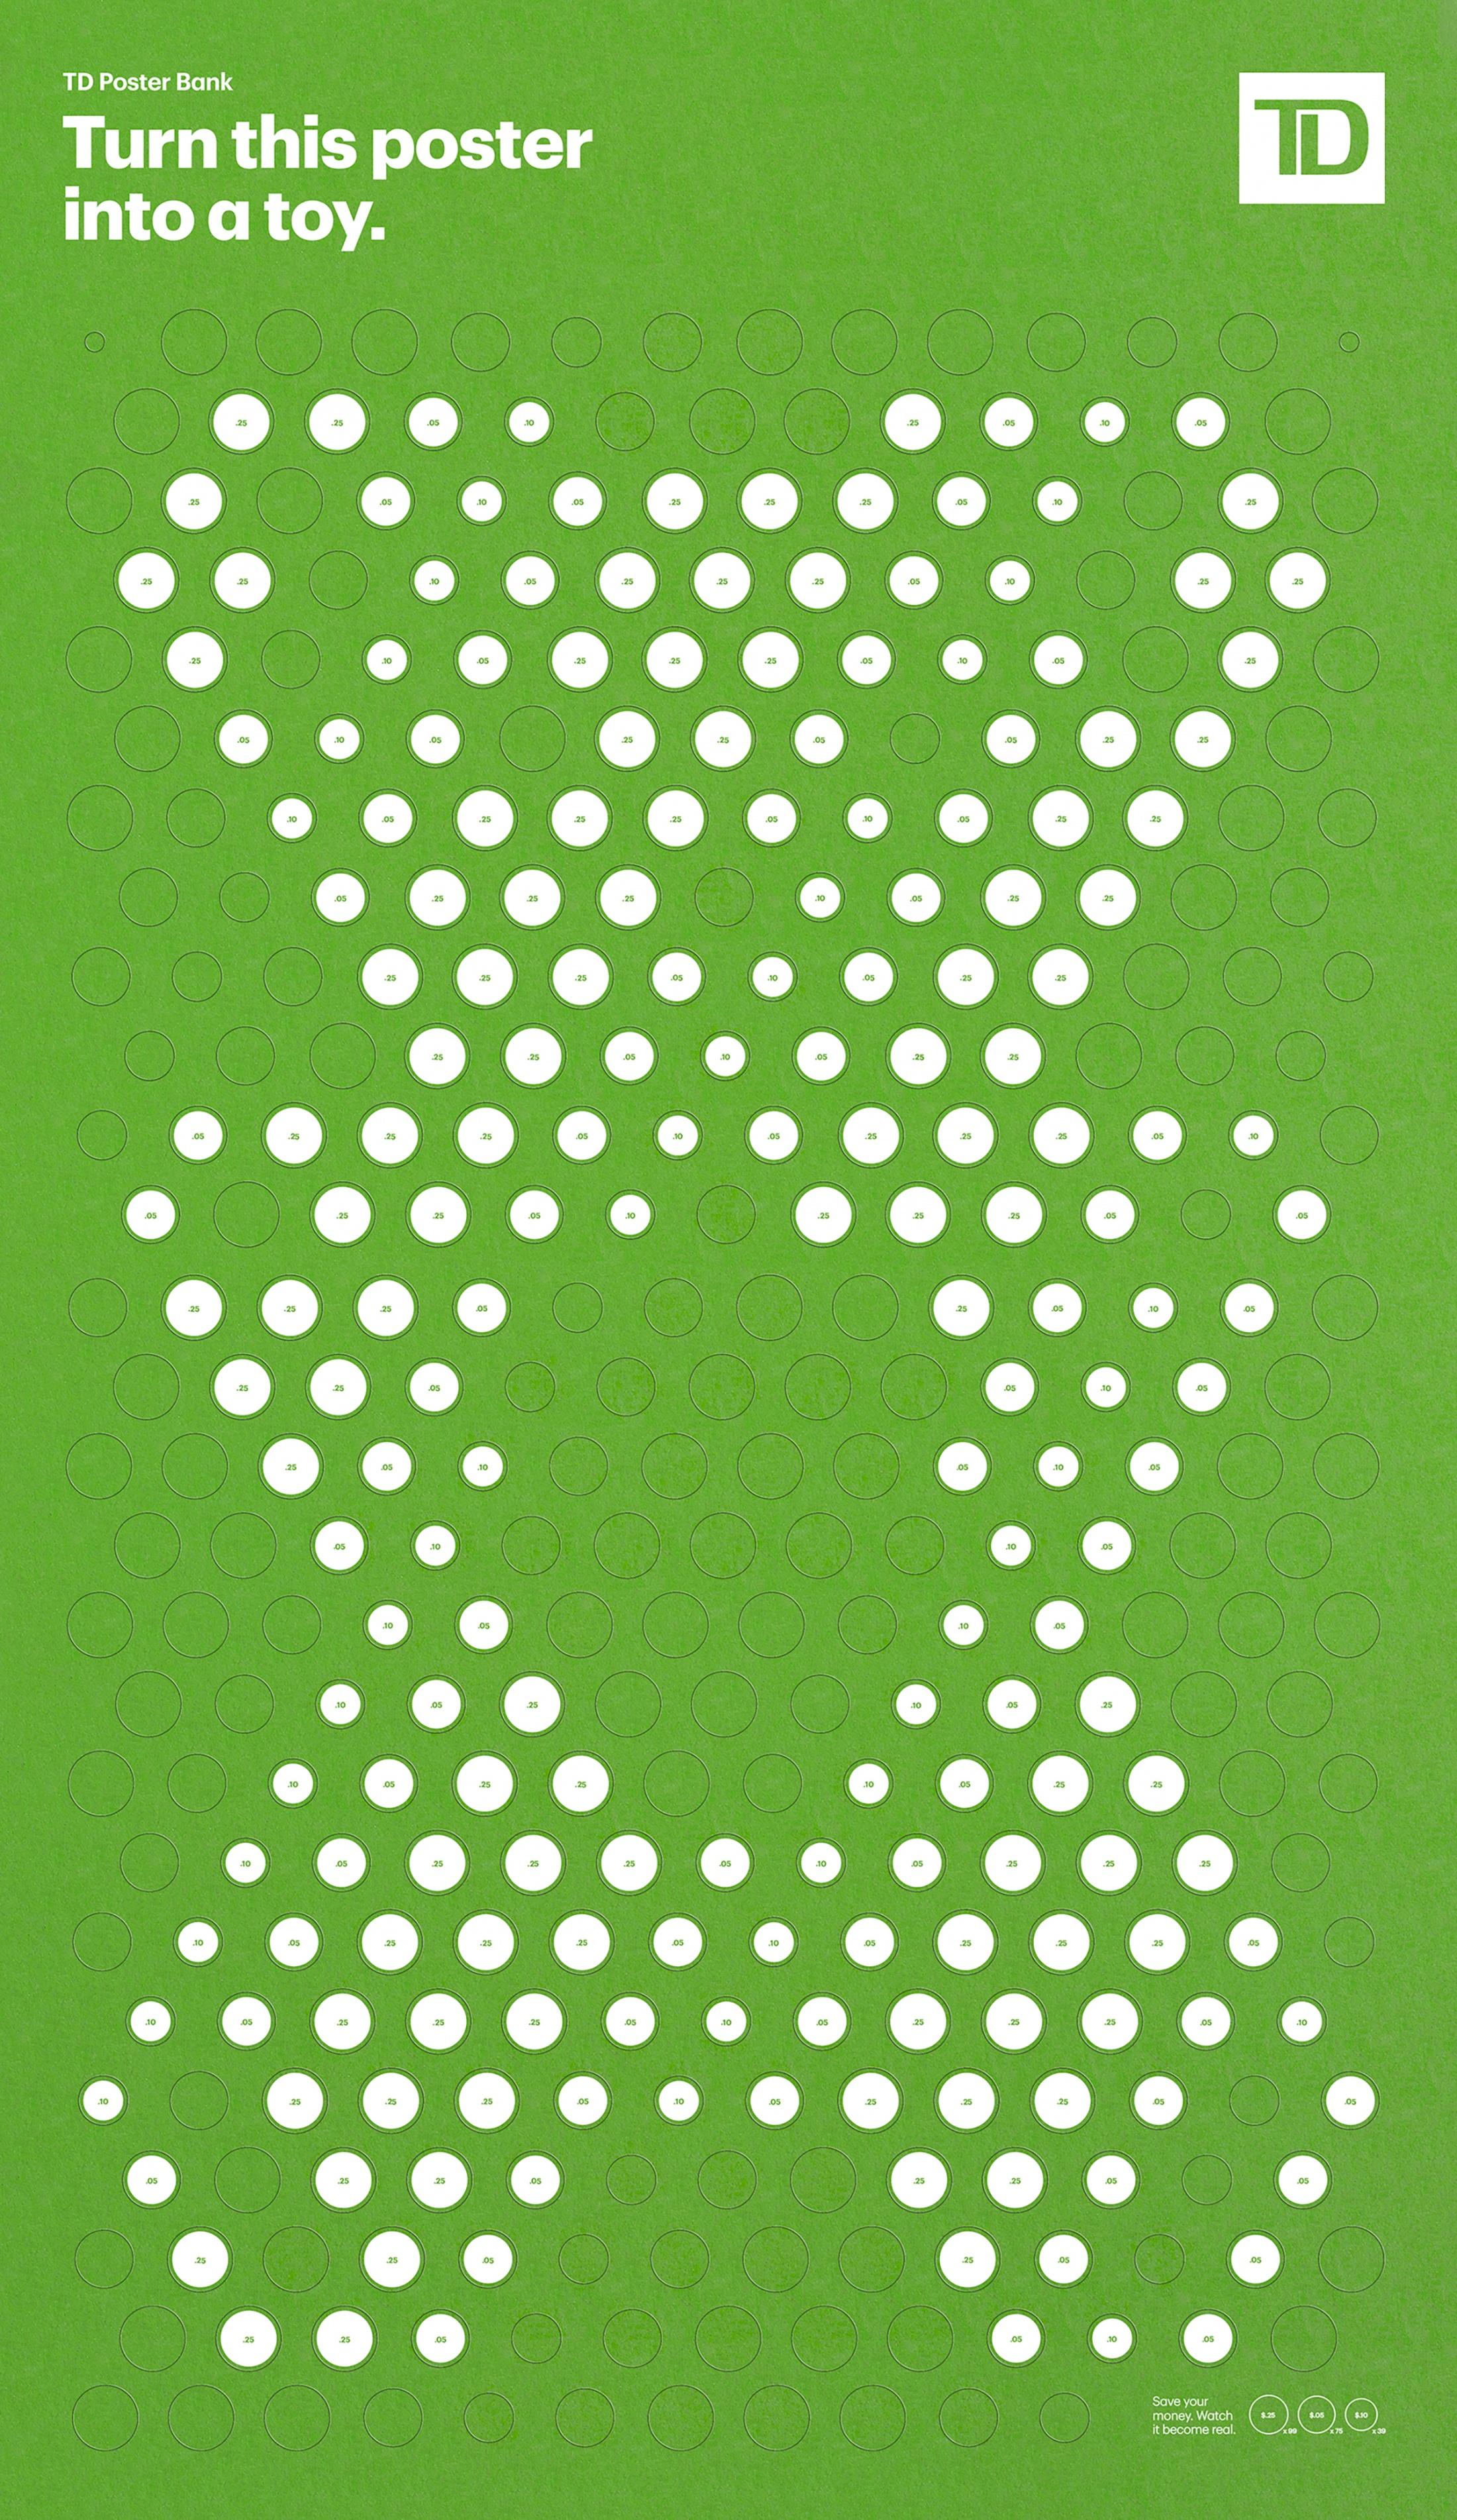 Thumbnail for TD Poster Bank